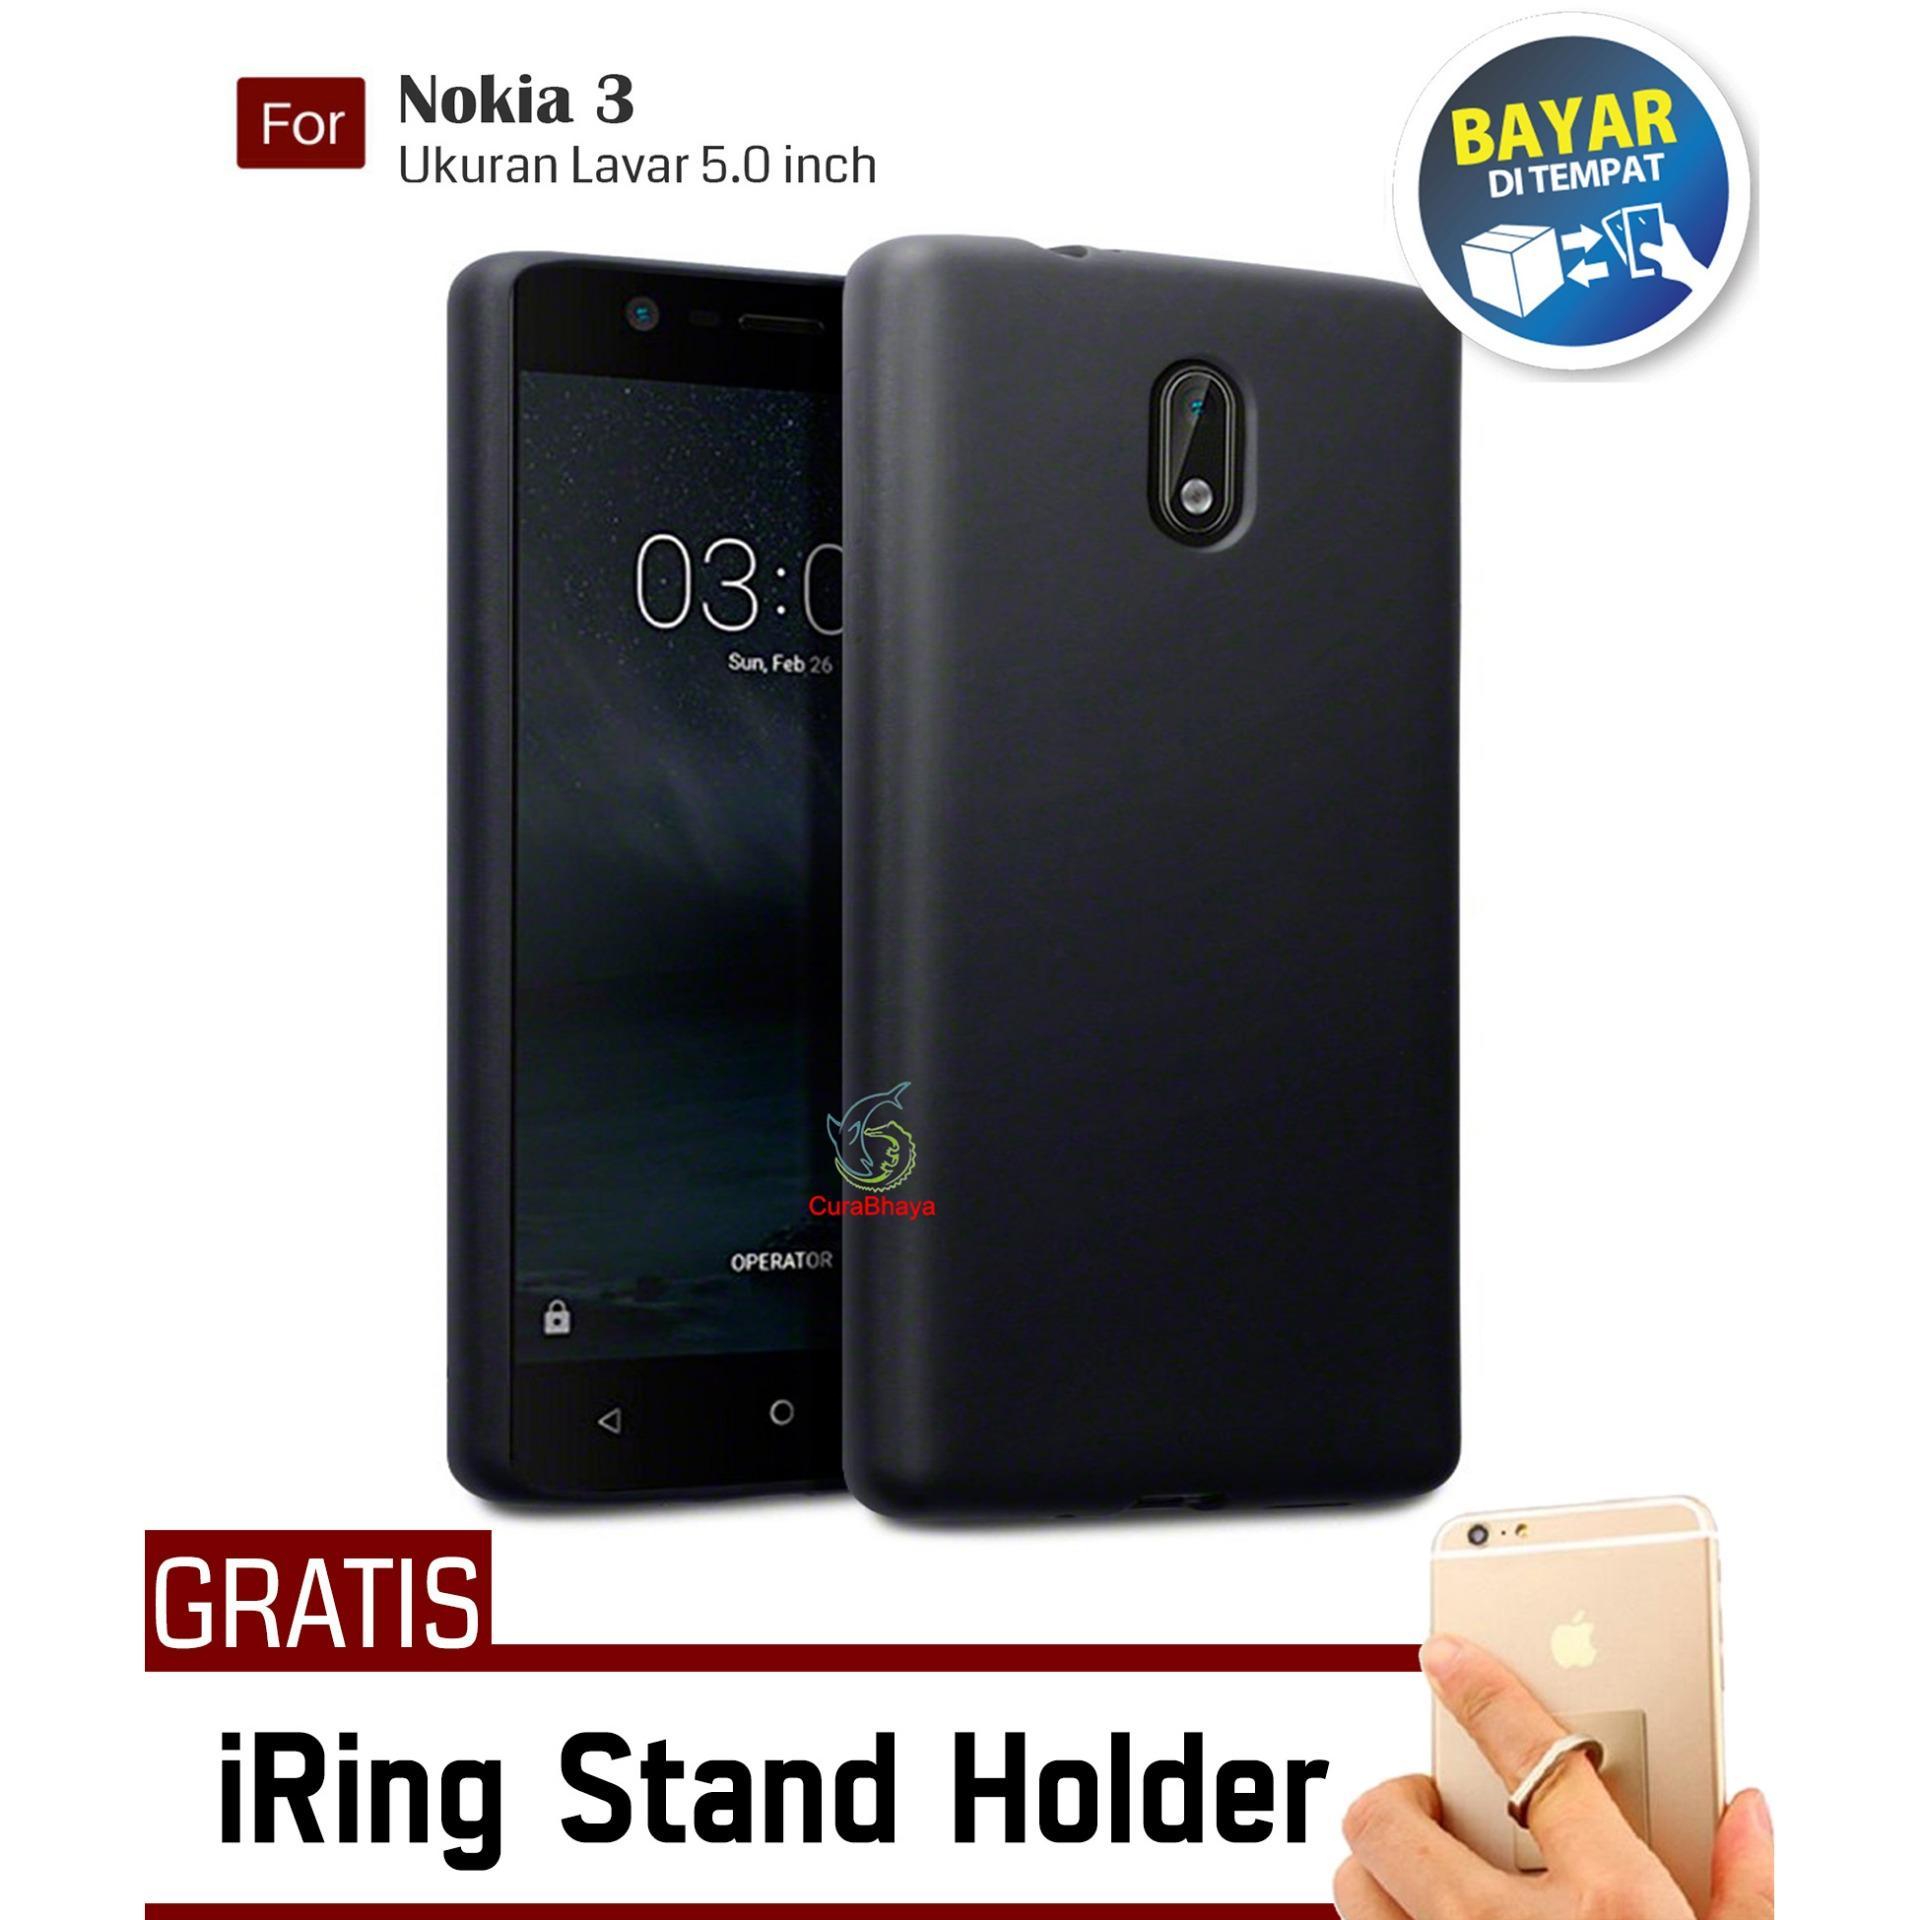 MidNight Nokia 3 | Slim Case Black Matte Softcase Premium Baby Skin + Gratis Free iRing